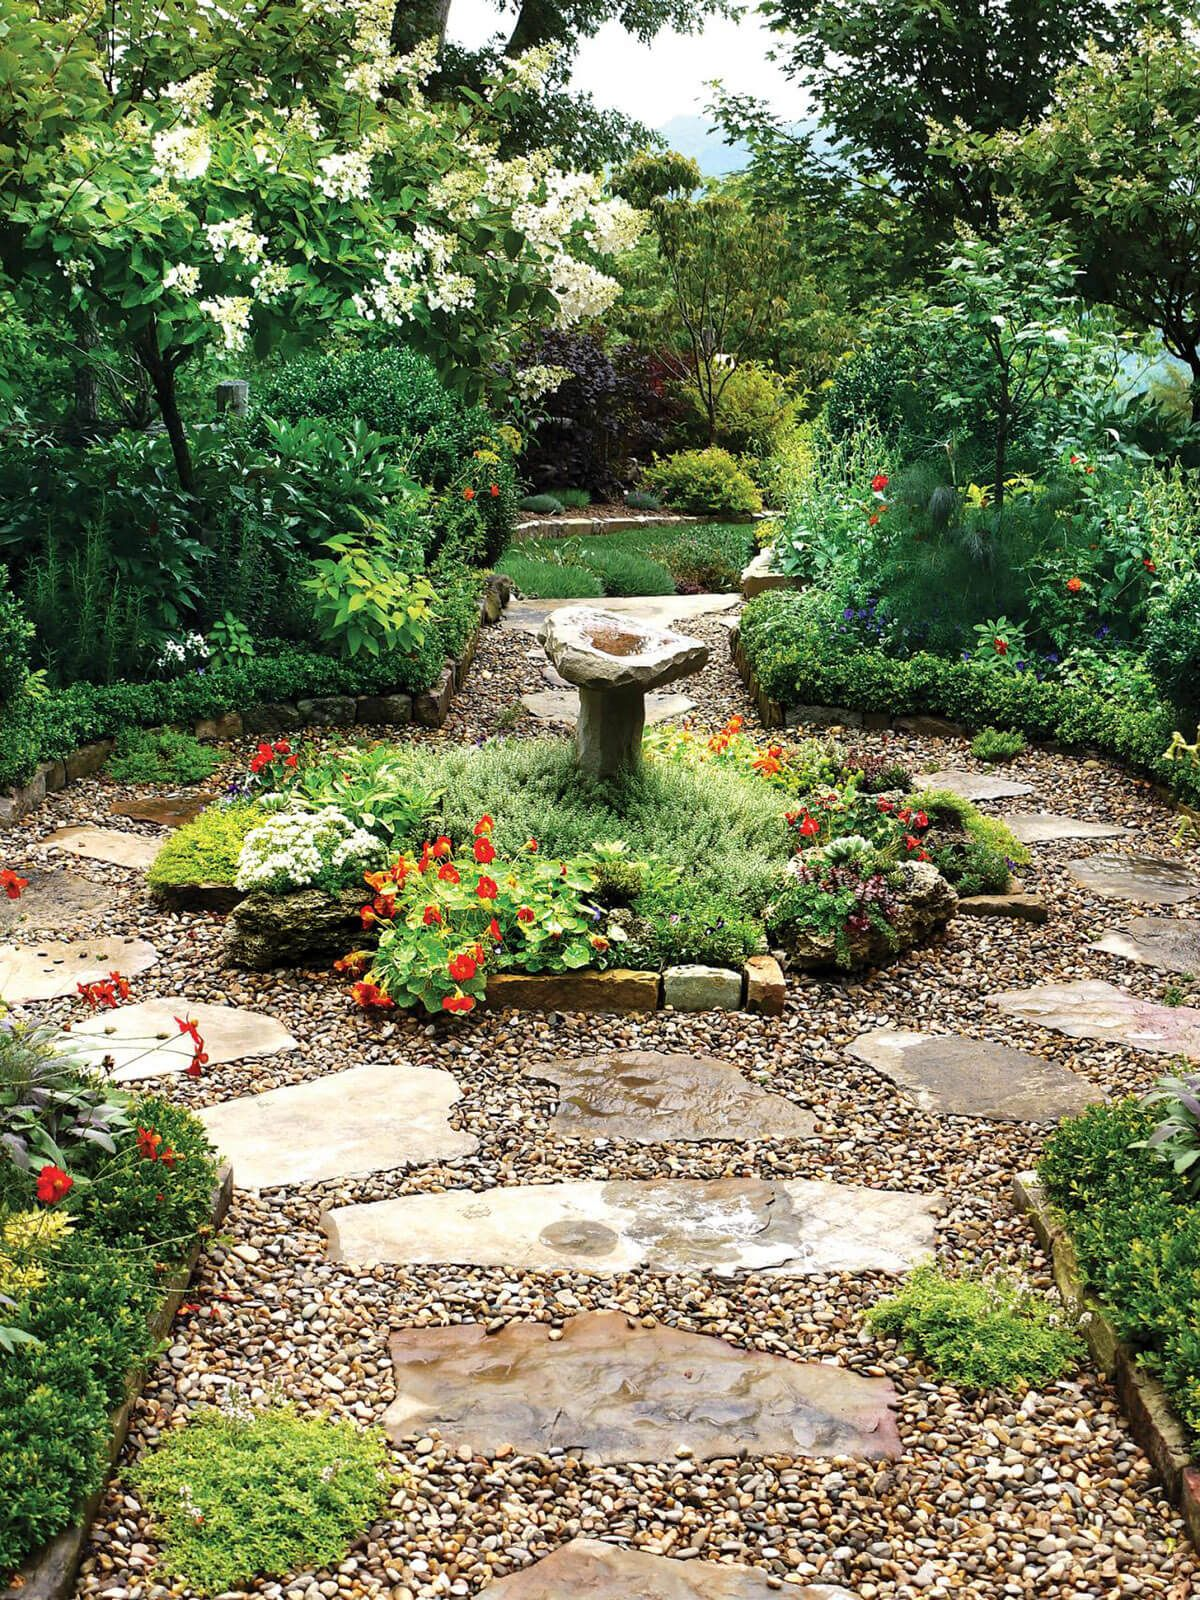 How to make a garden path with gravel - Romantic Stone Walkway Embraces A Garden Fountain